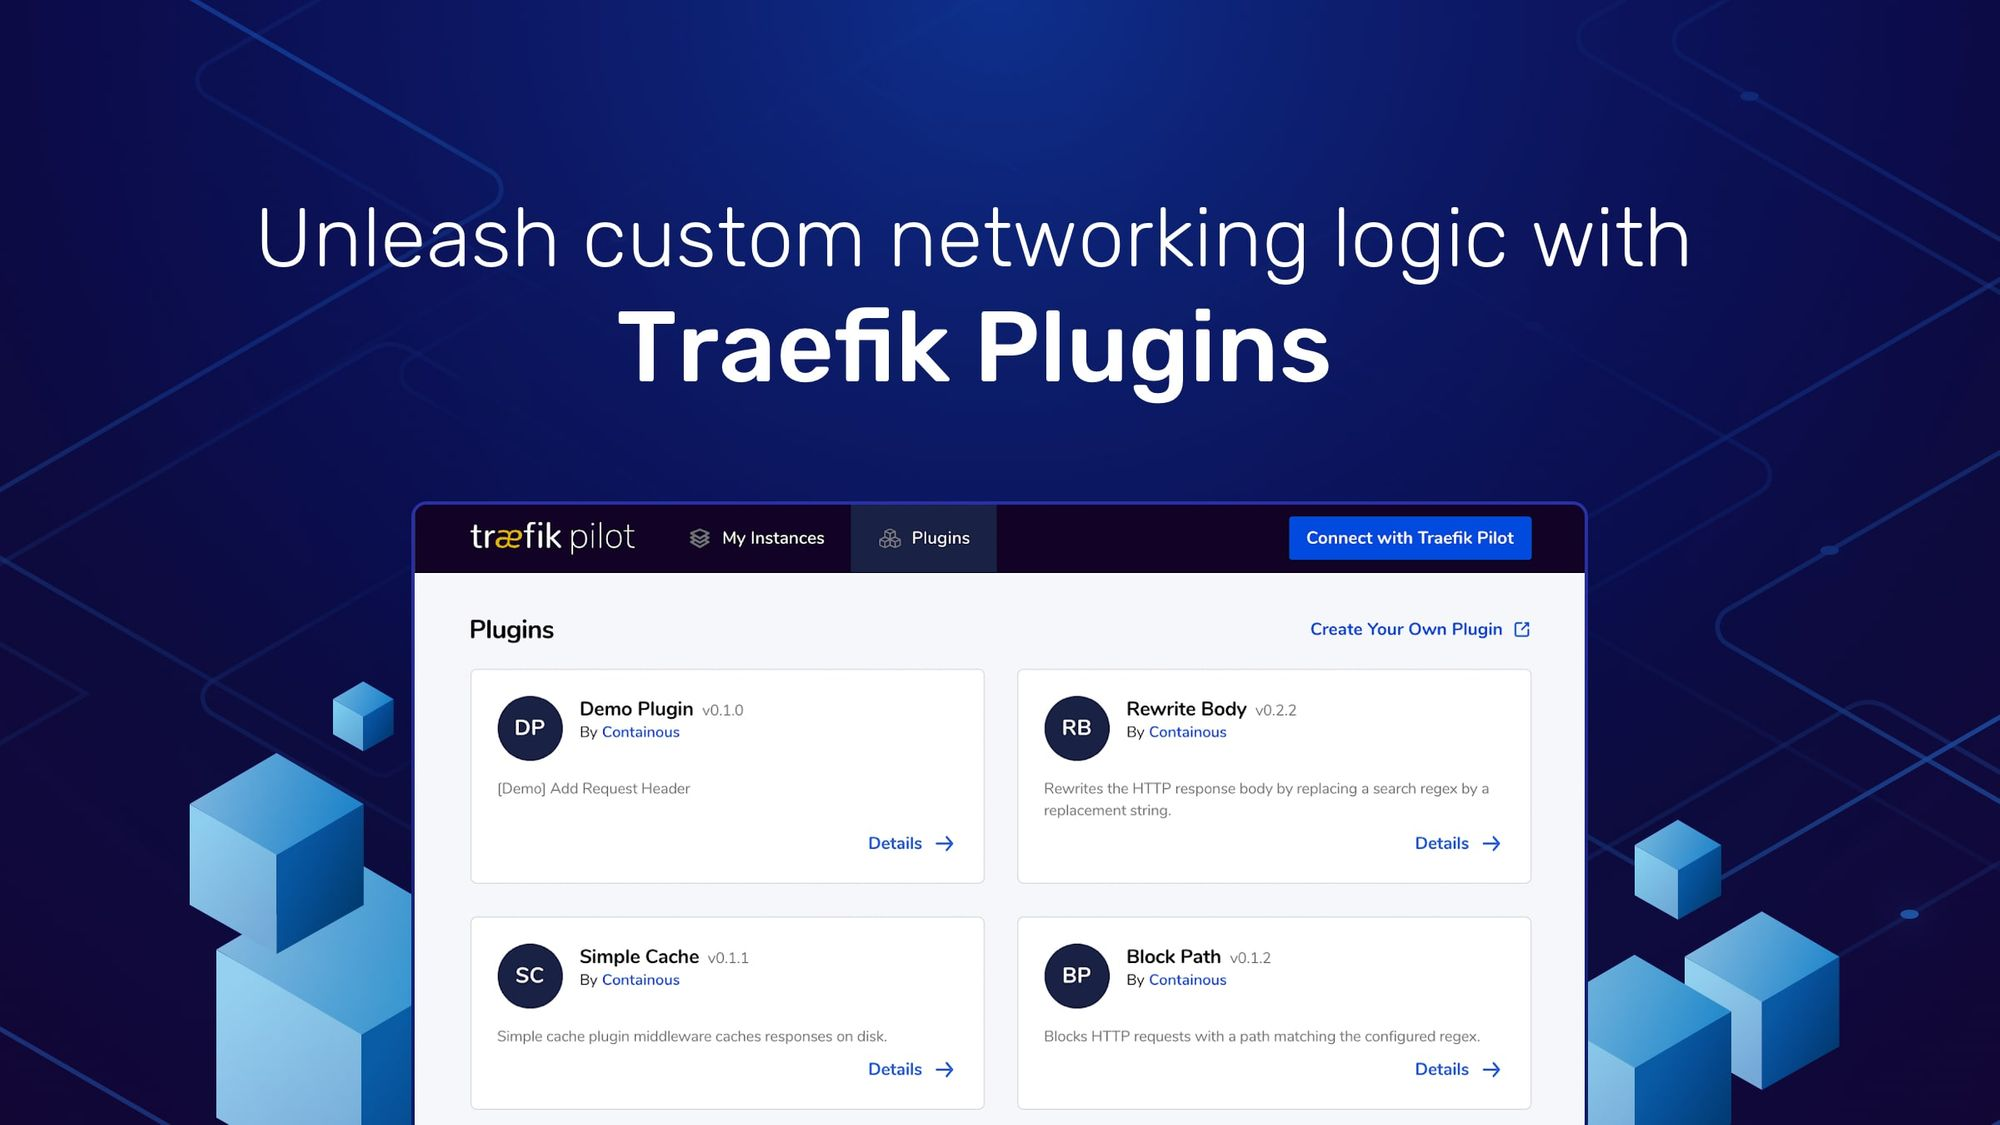 Unleash custom networking logic with Traefik Plugins